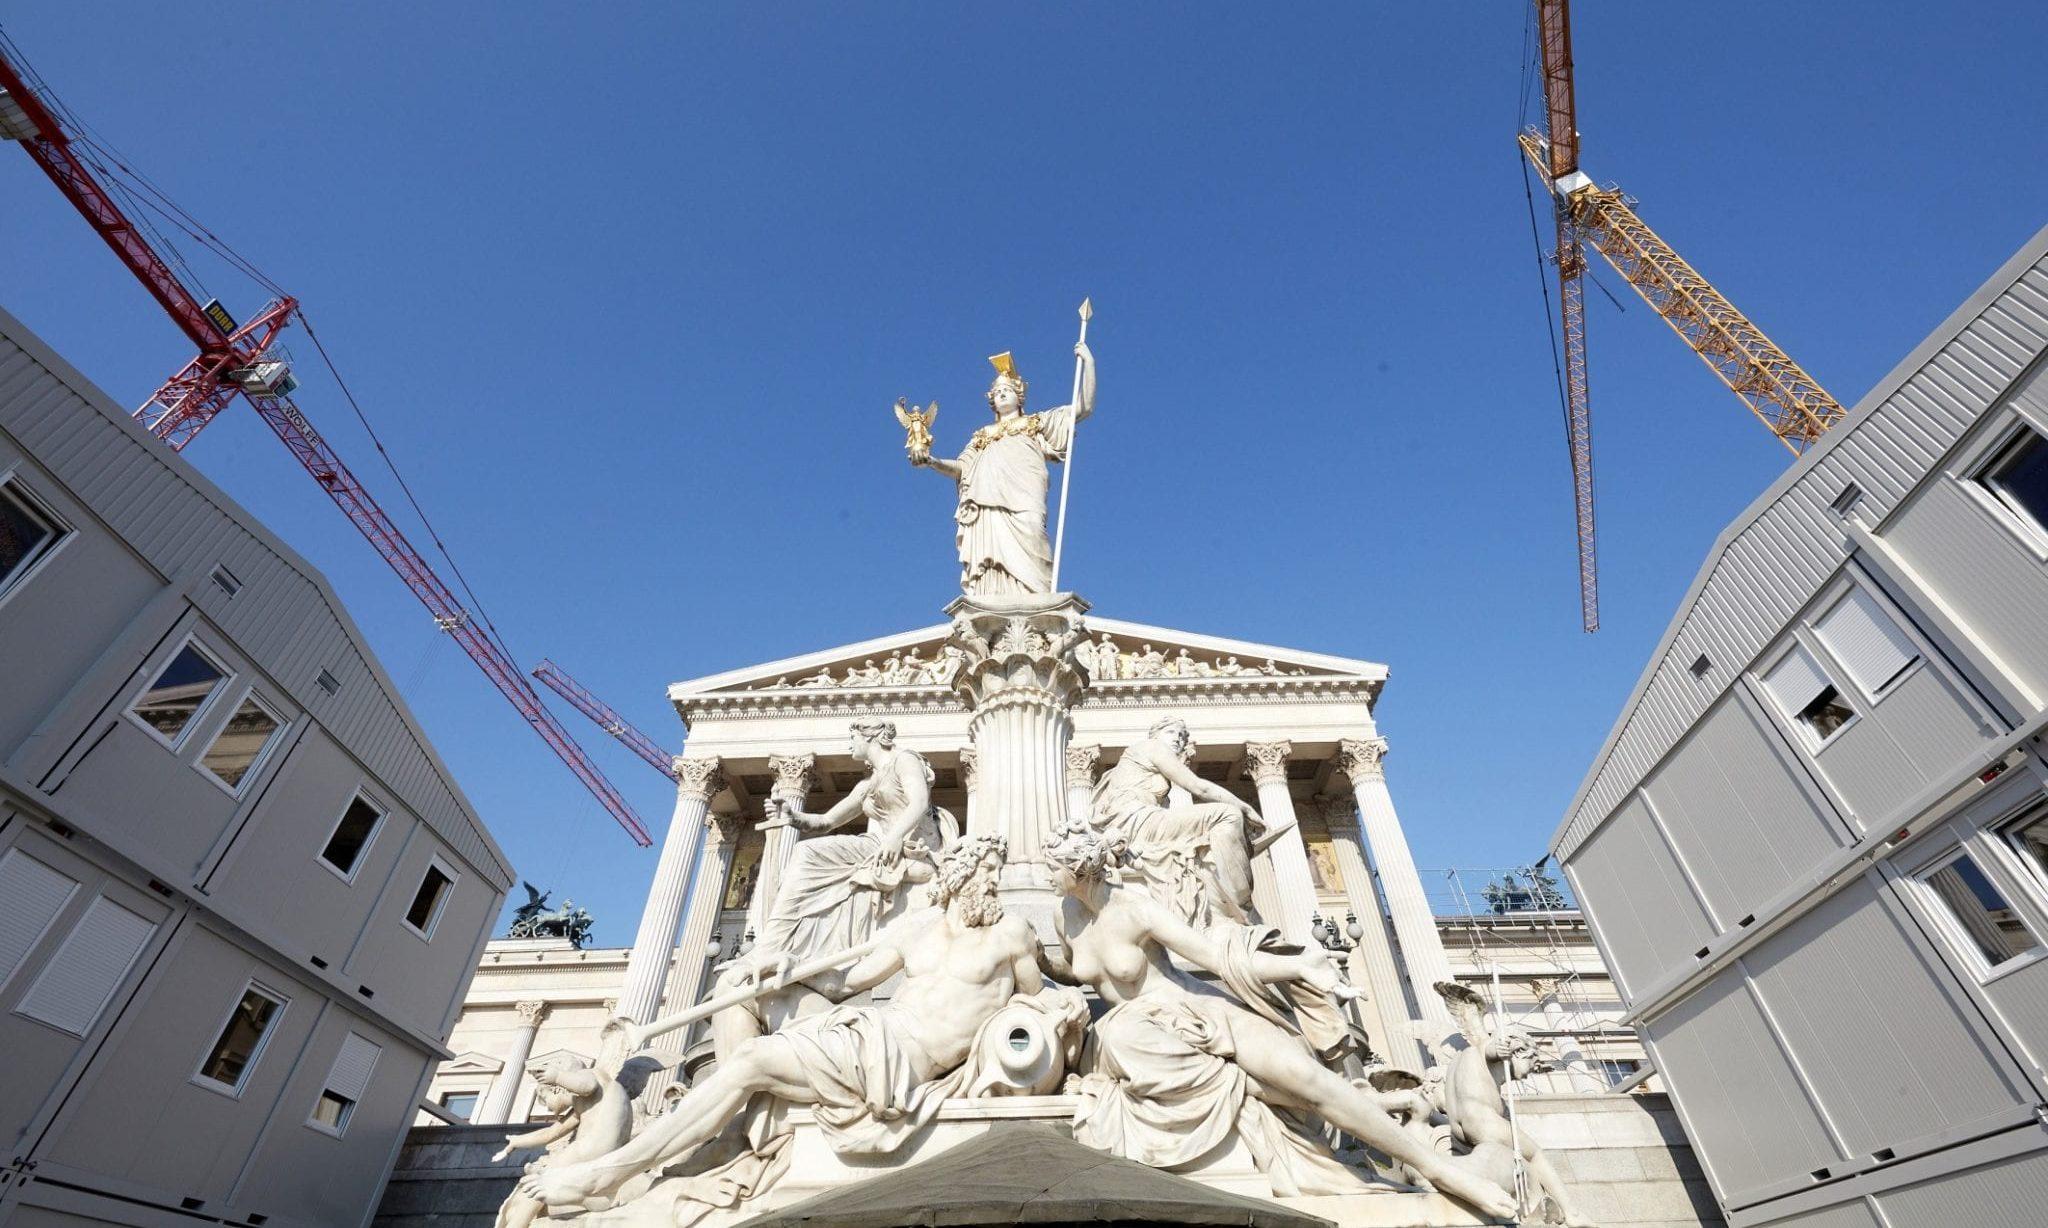 Parlamentsgebäude / Baustelle